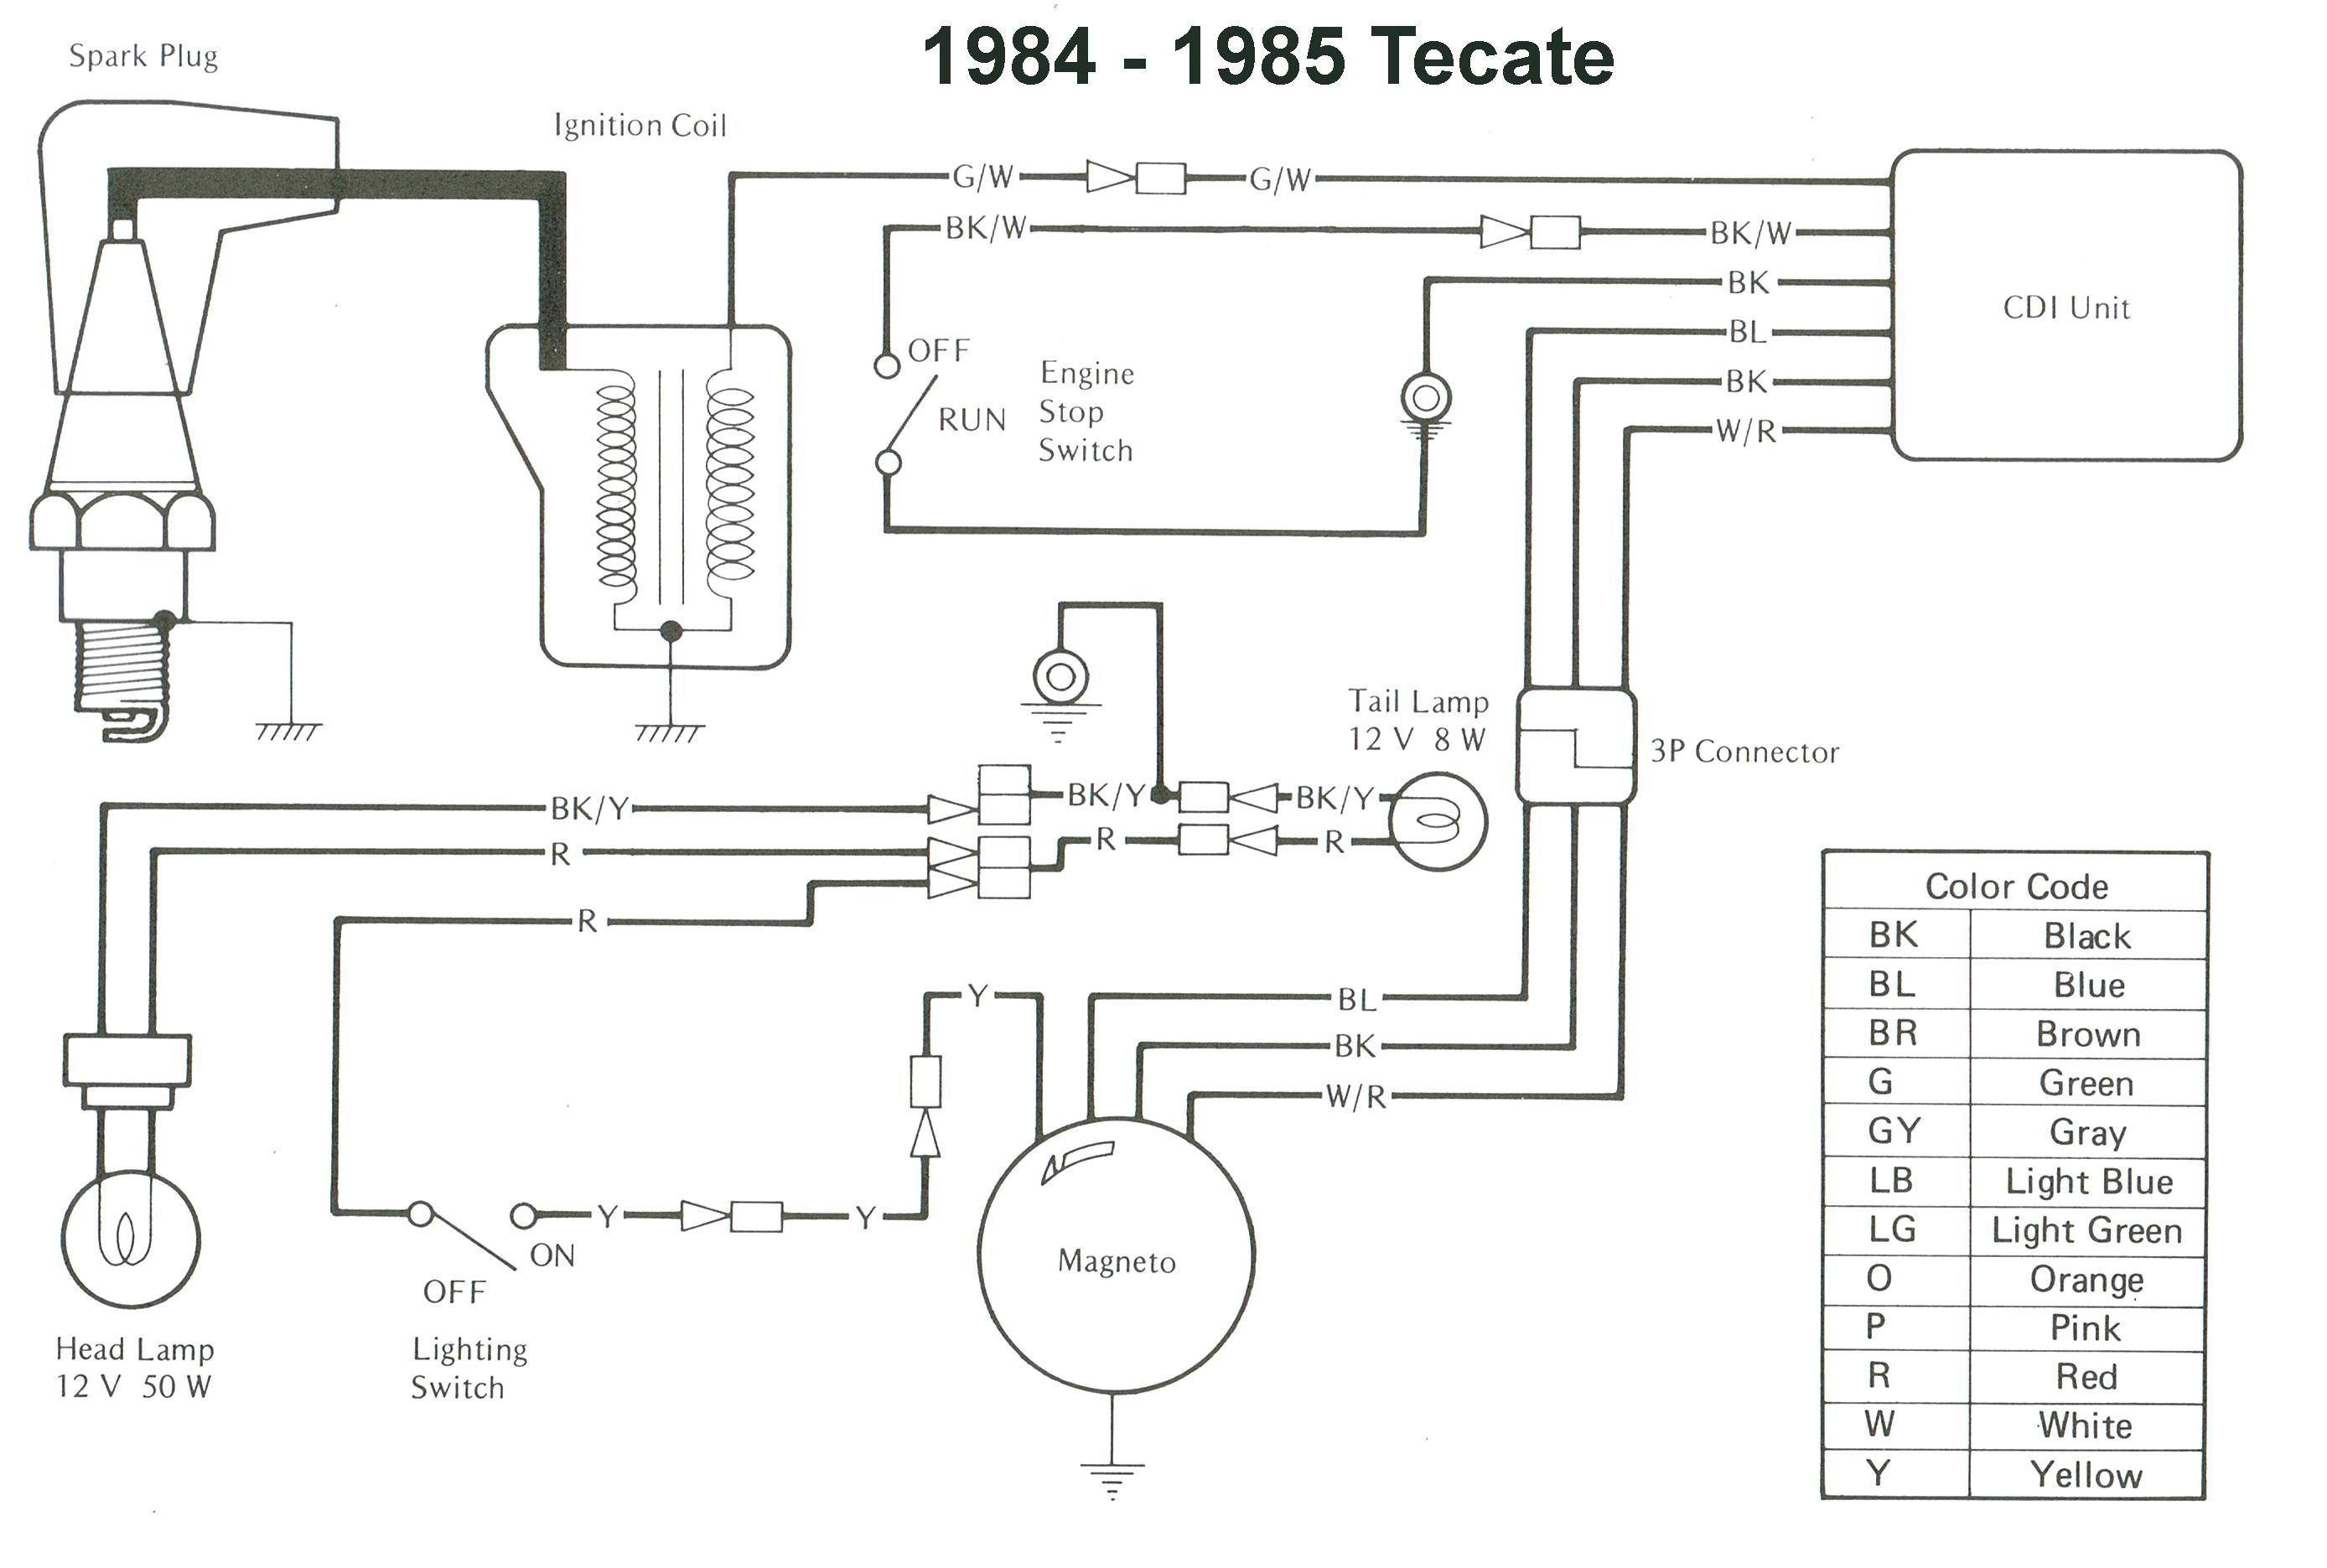 polaris ranger engine diagram polaris ranger turn signal wiring rh detoxicrecenze com